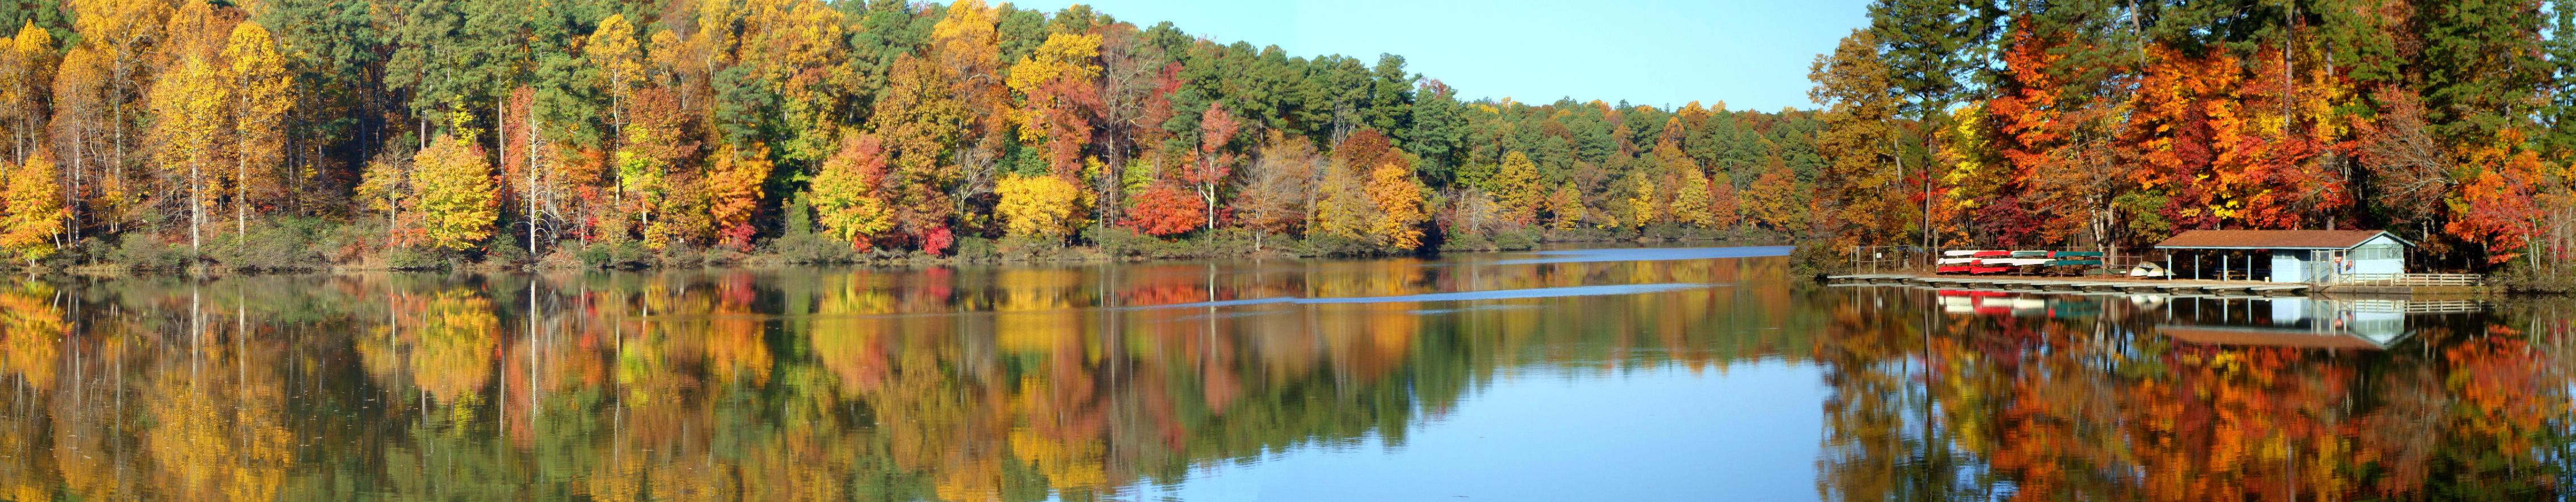 Umstead State Park North Carolina